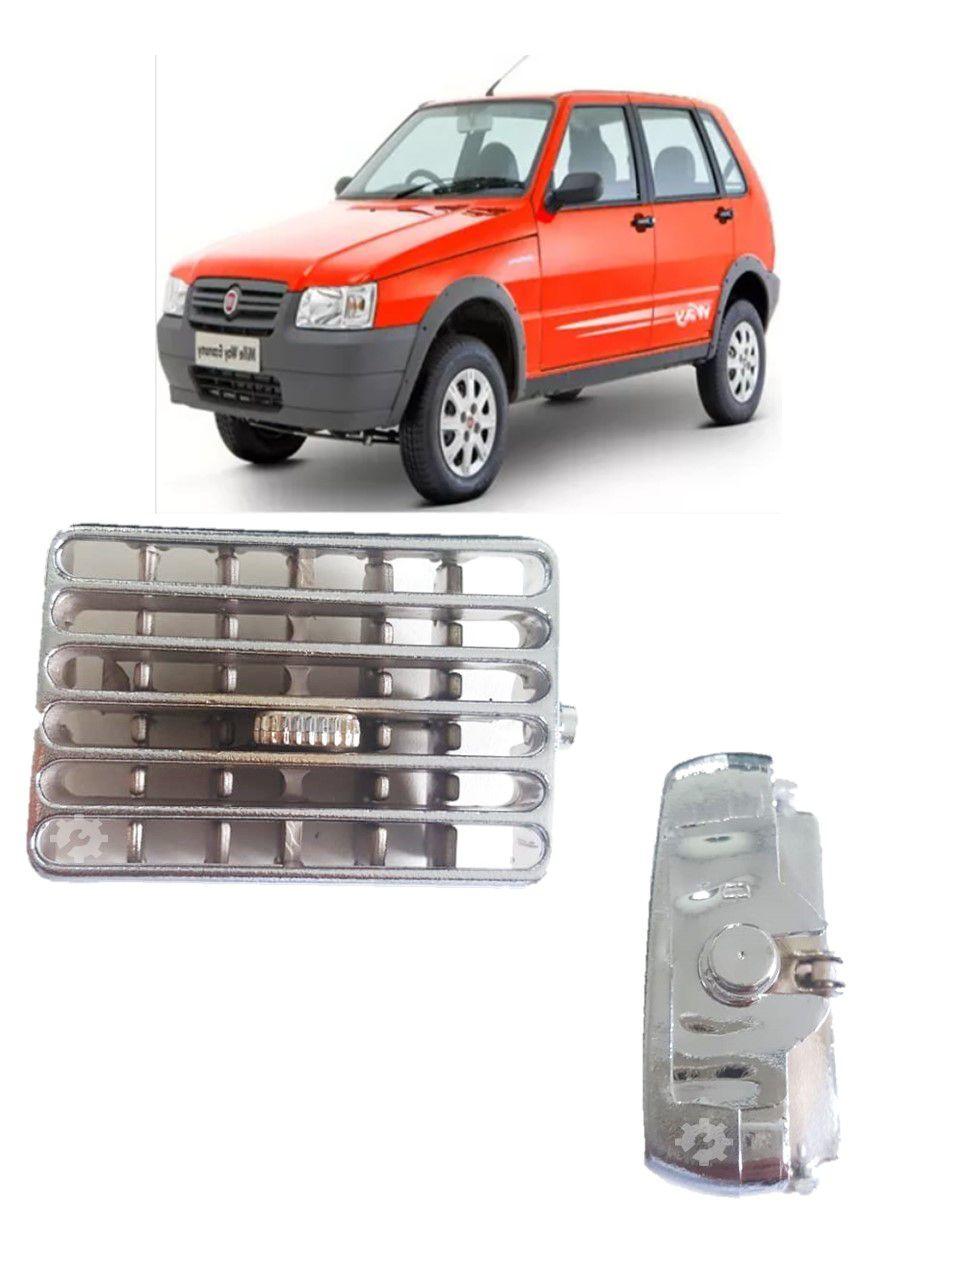 Difusor Ar Lateral Esquerdo Cromado Fiat Uno 1995 2002 2008